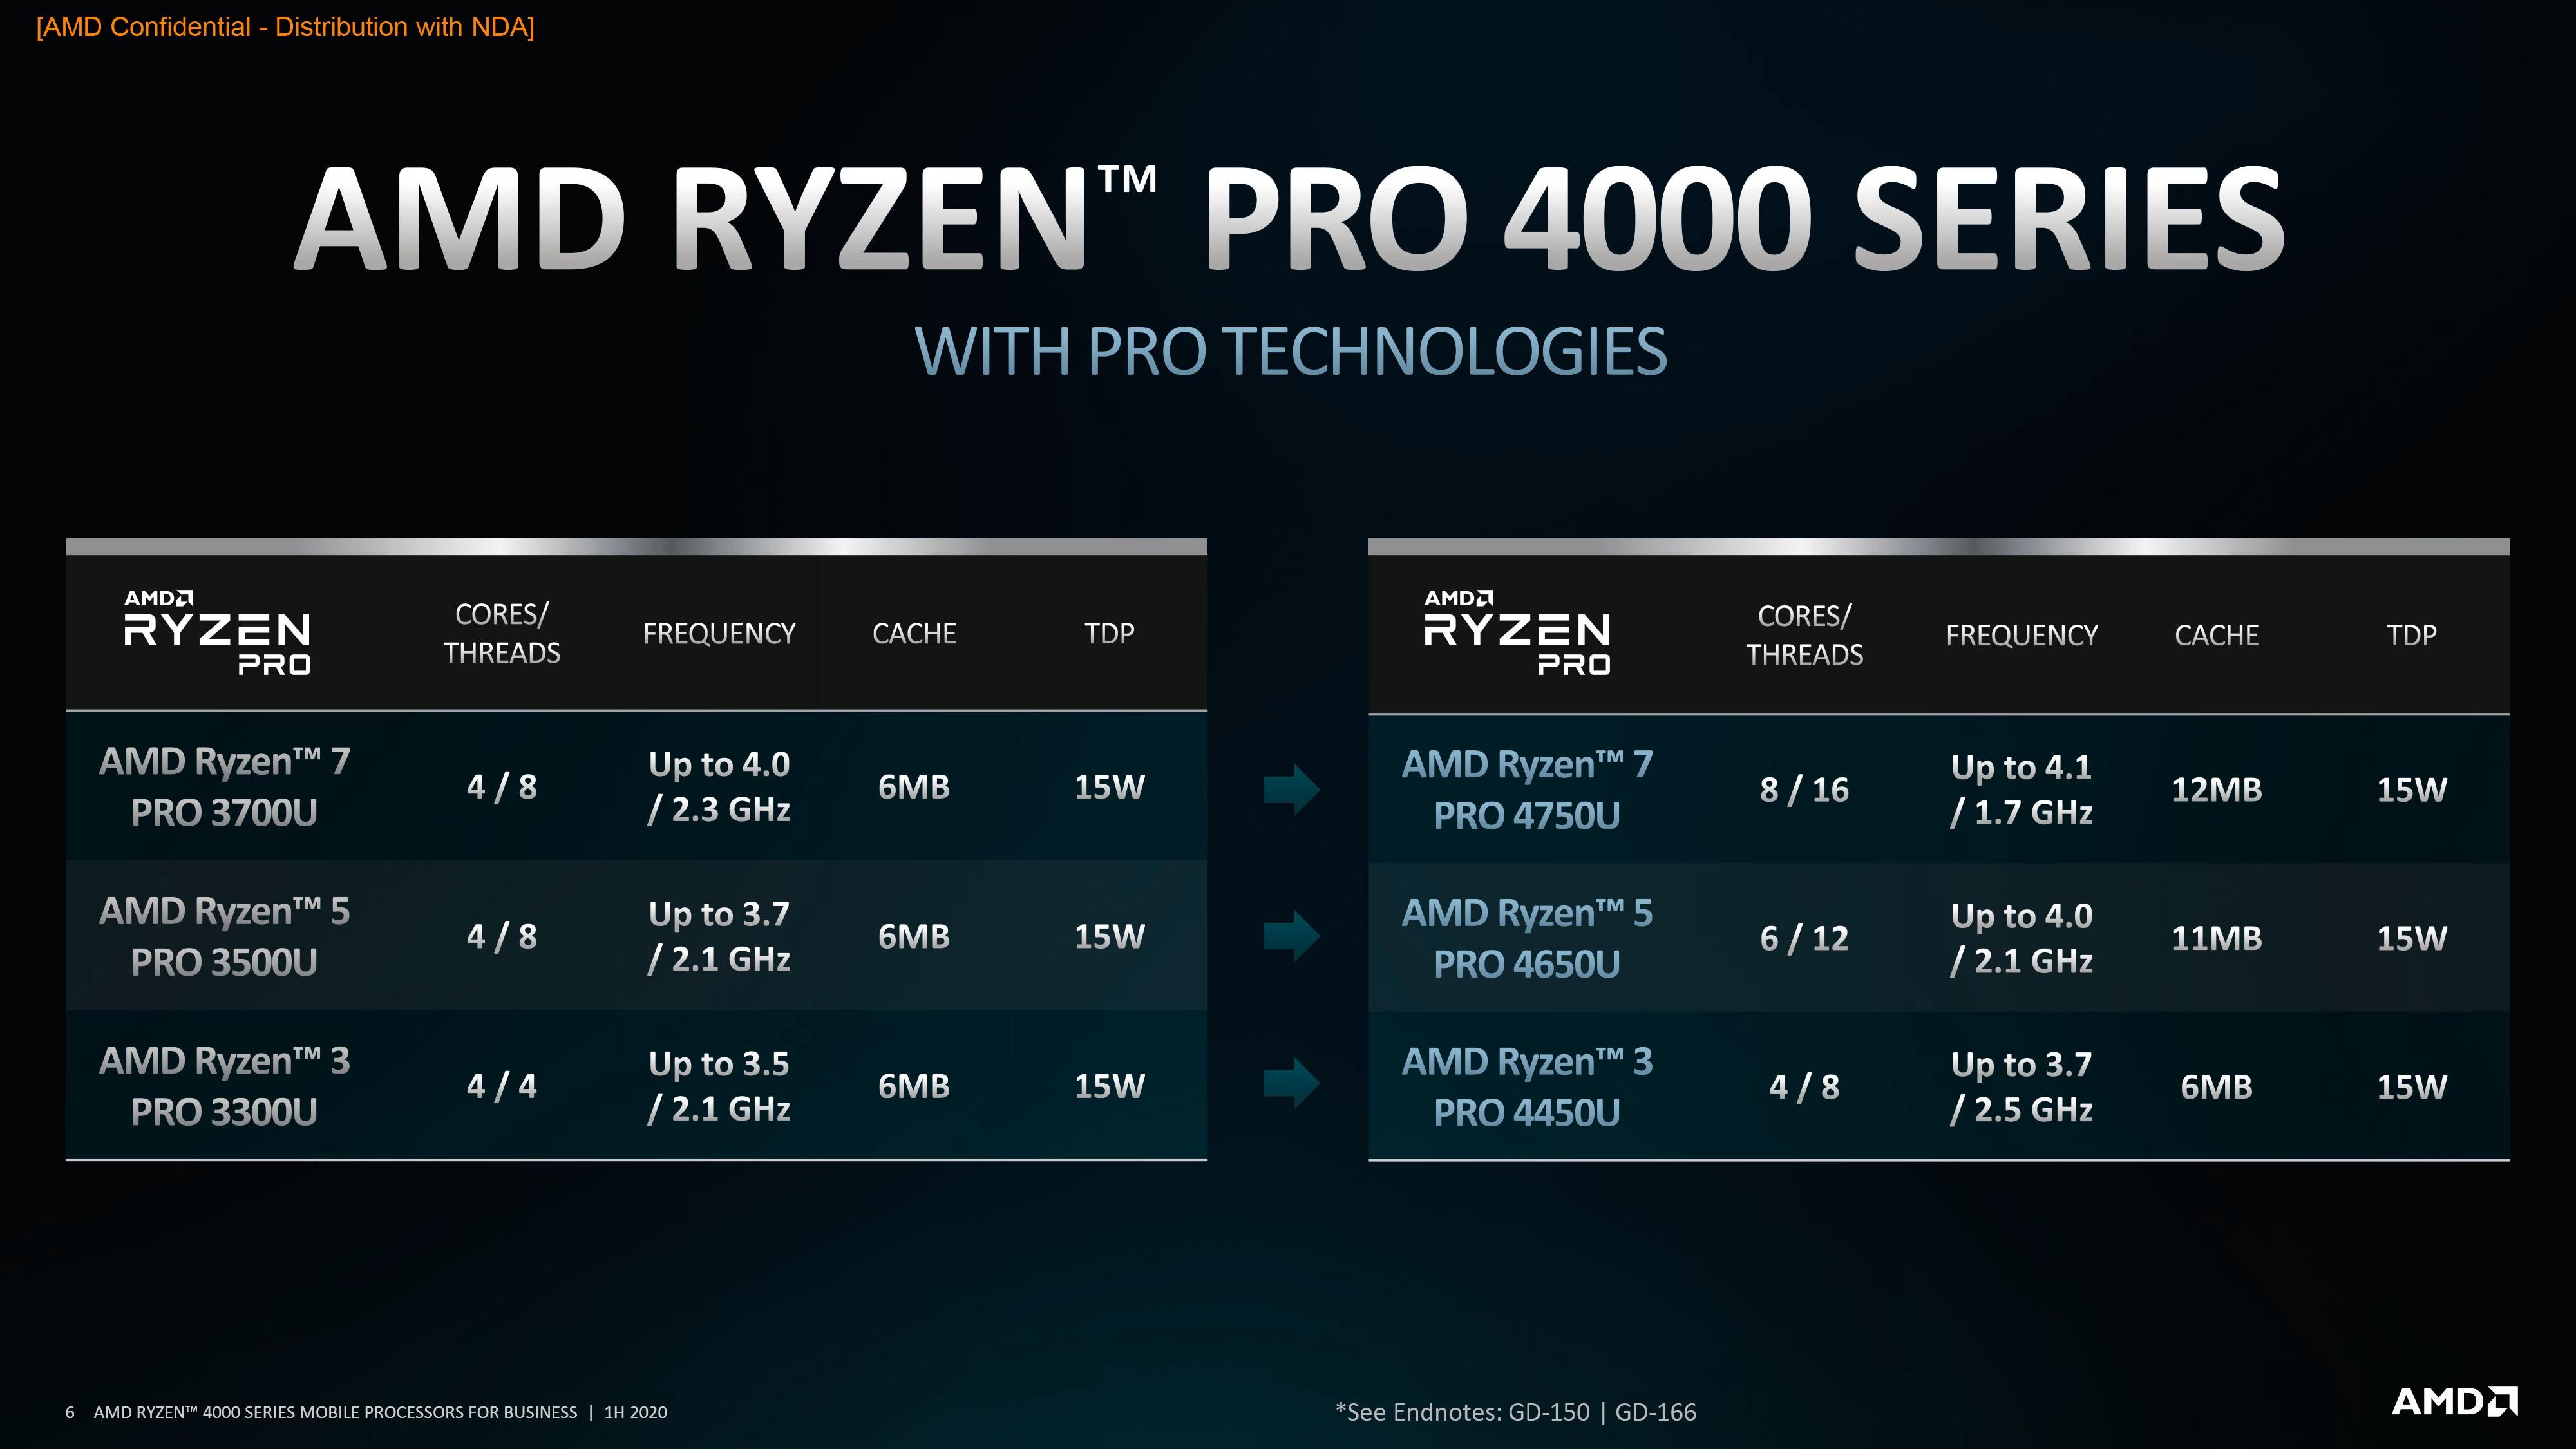 AMD Ryzen PRO 4000 Series Mobile Processors 1H20